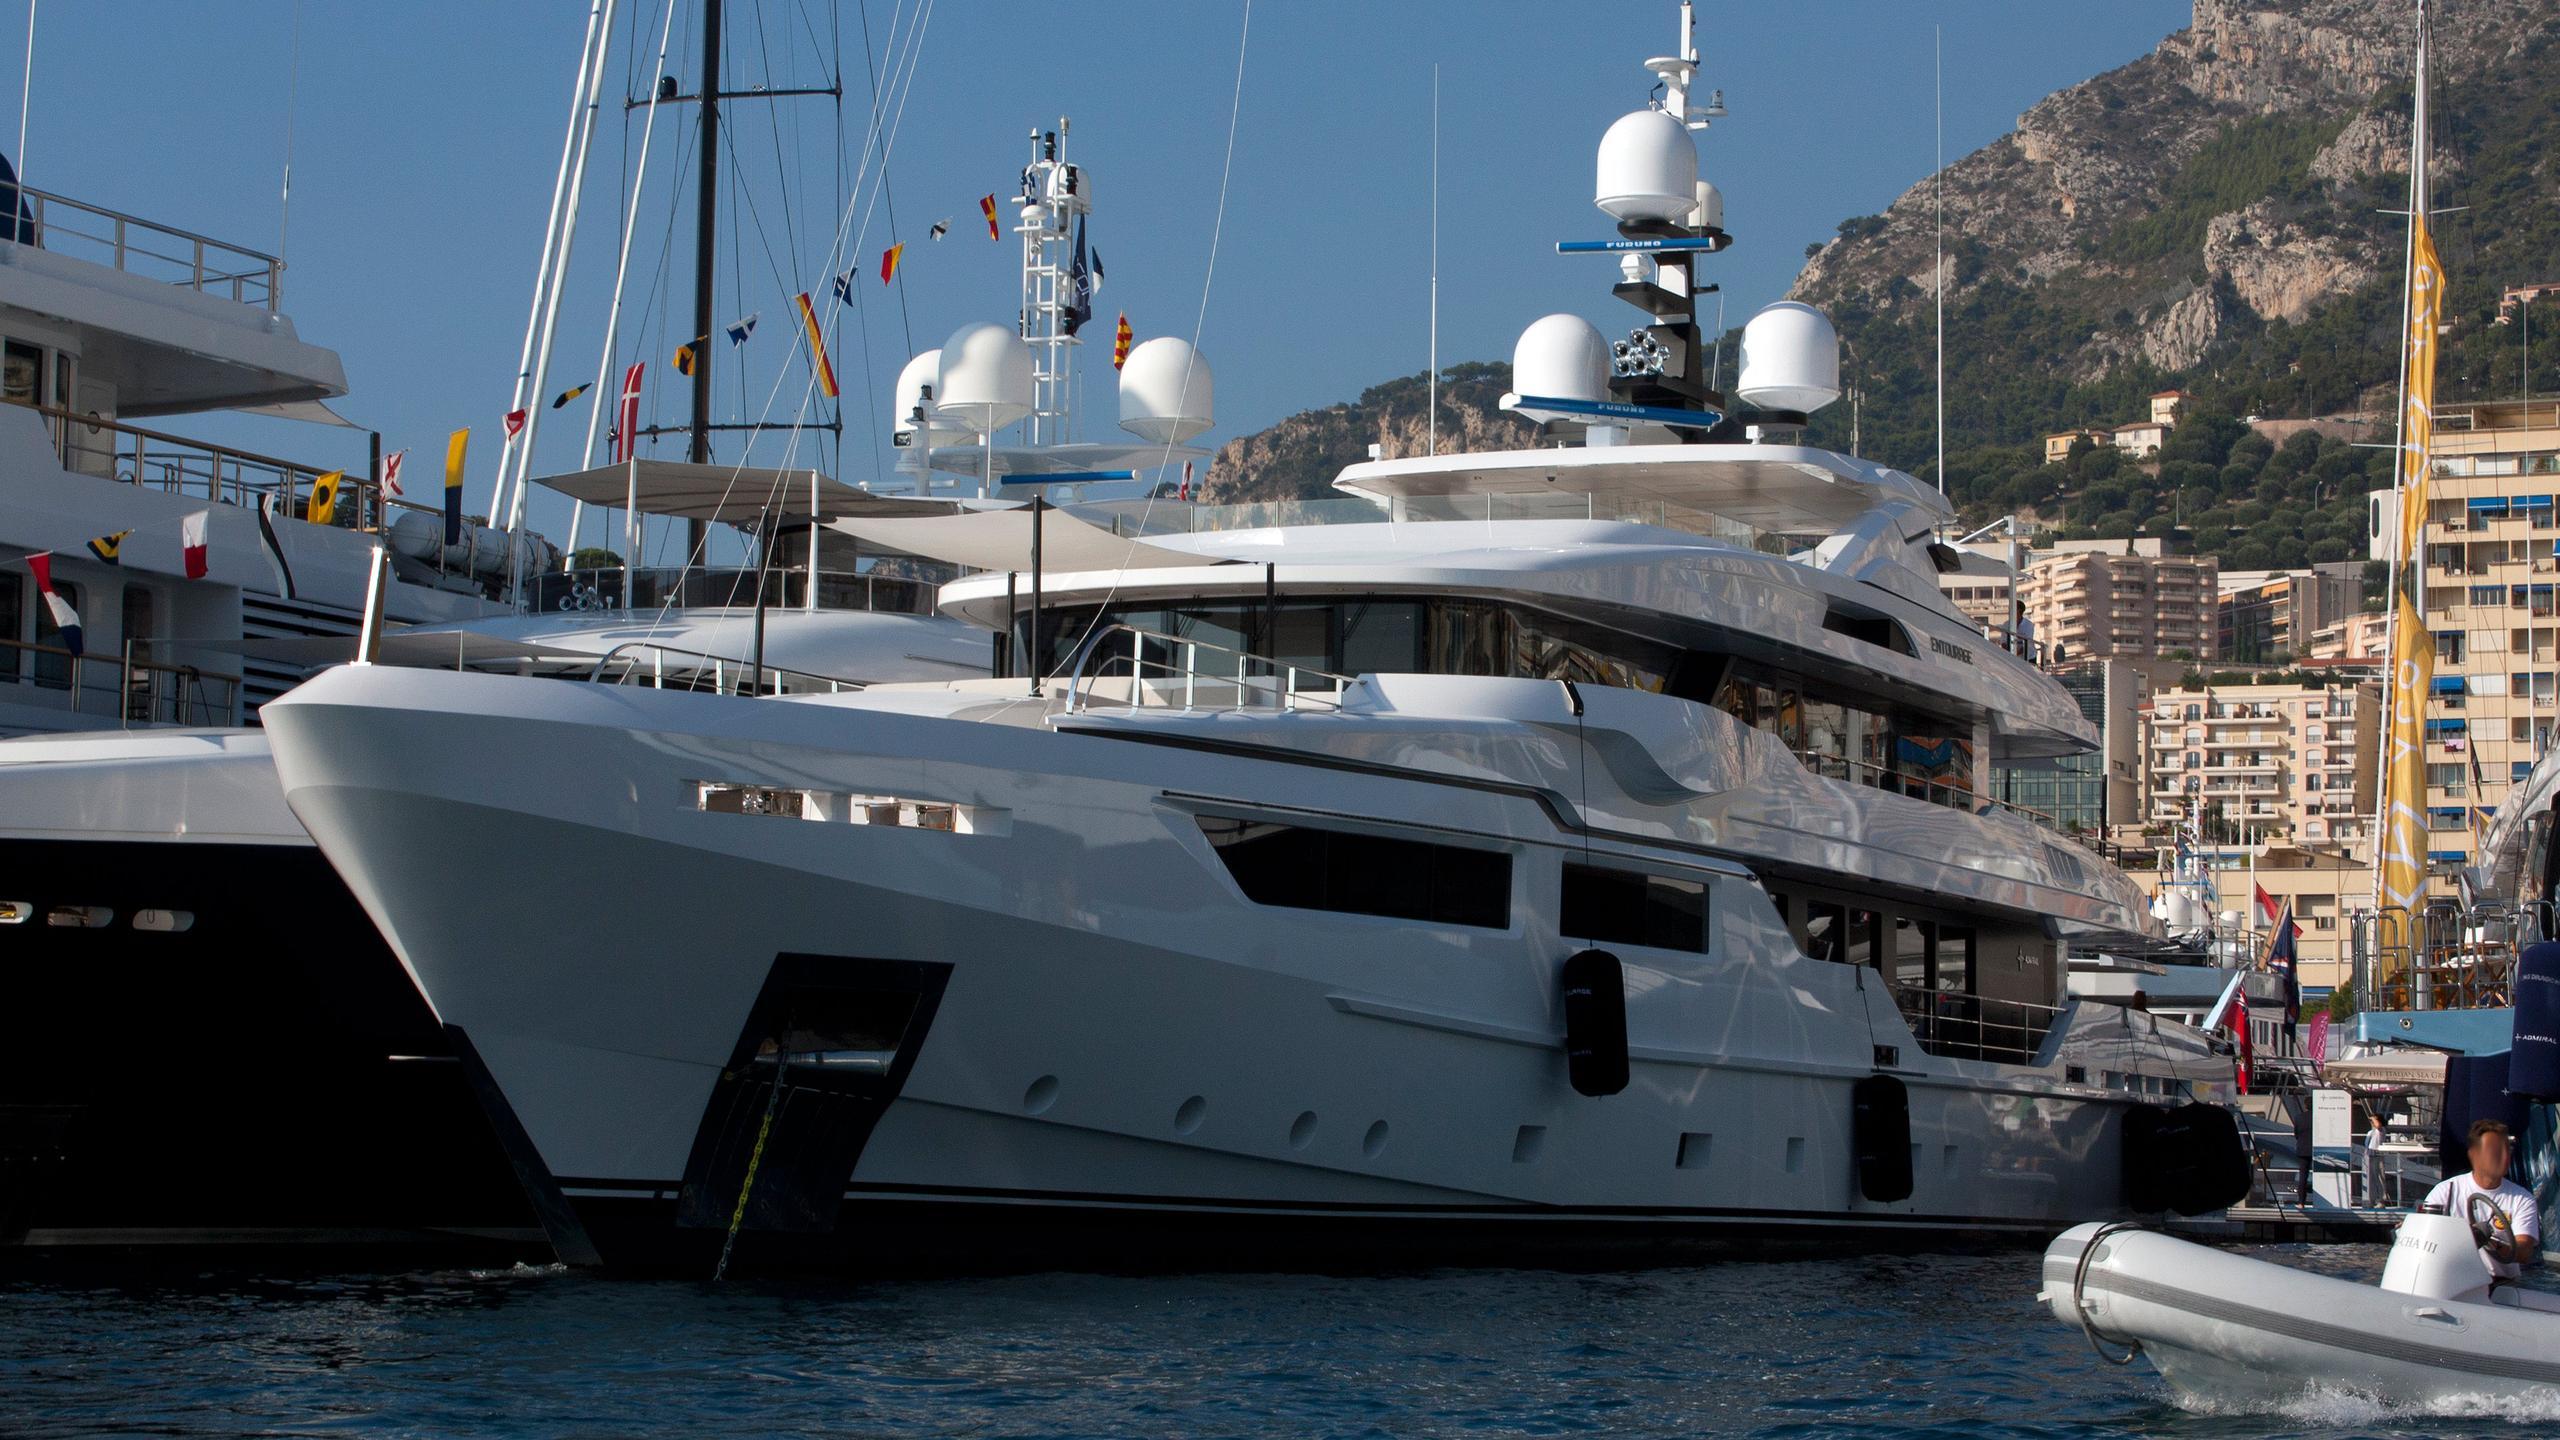 entourage-motor-yacht-admiral-the-italian-sea-group-2014-47m-bow-moored